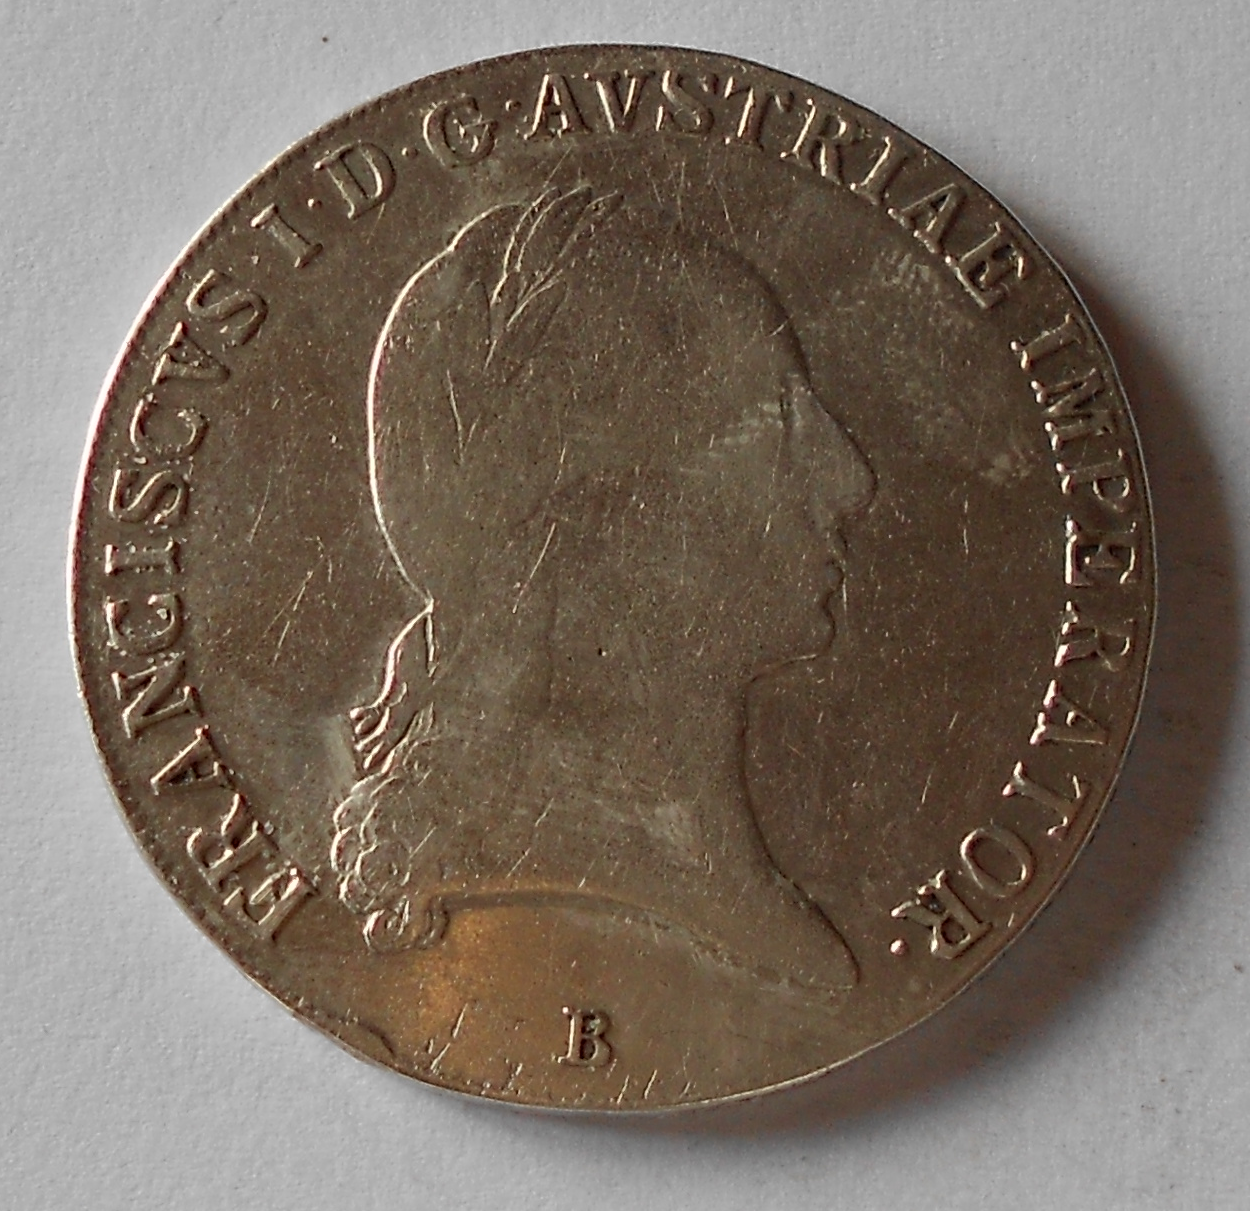 Uhry Tolar konvenční 1822 B František II.